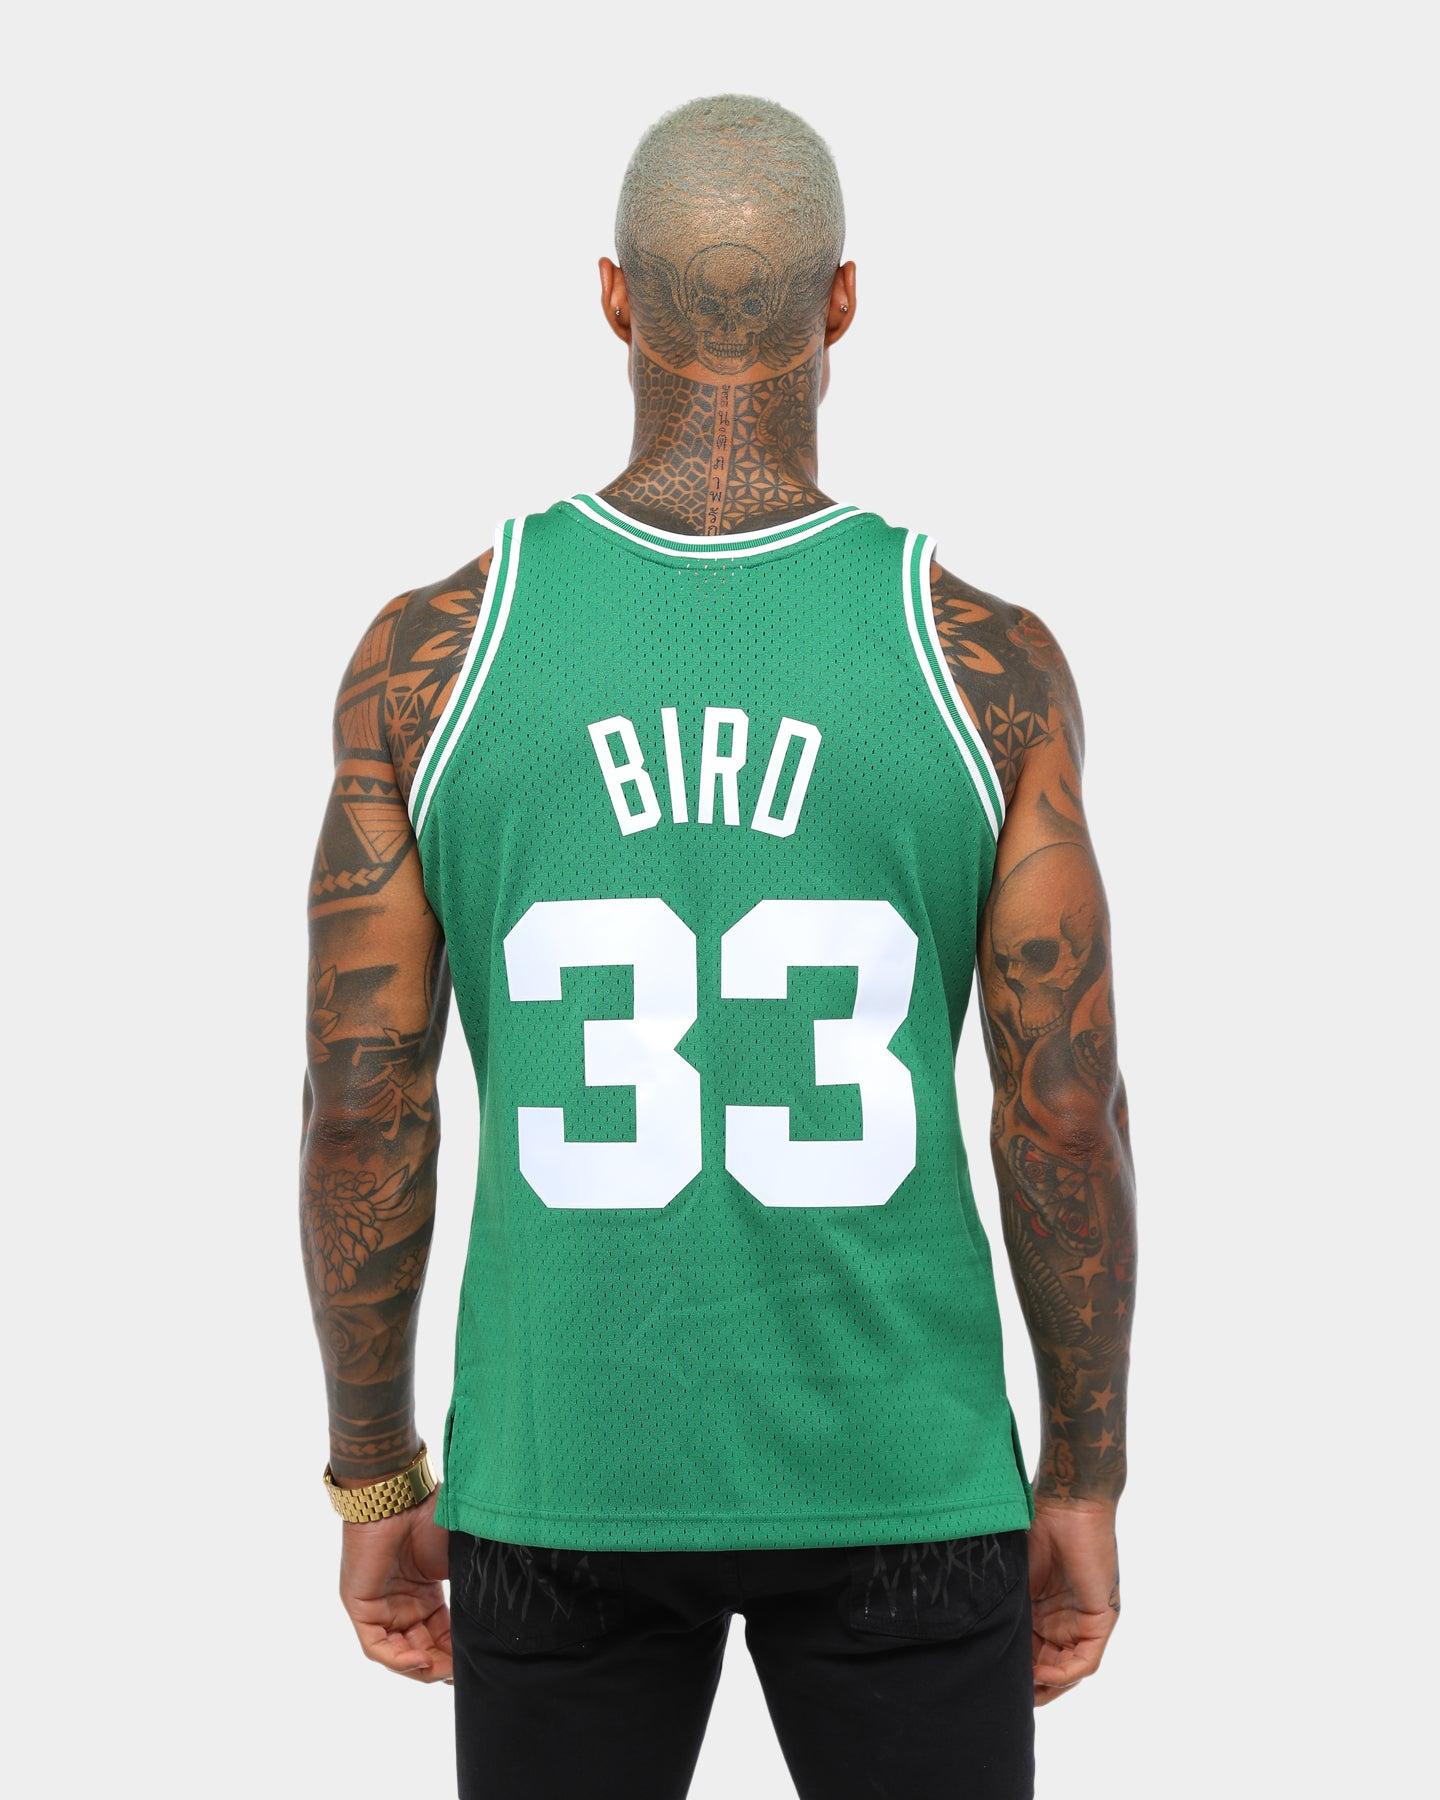 size S//M//L NBA Larry Bird #33 Boston Celtics RETRO Green Basketball jersey